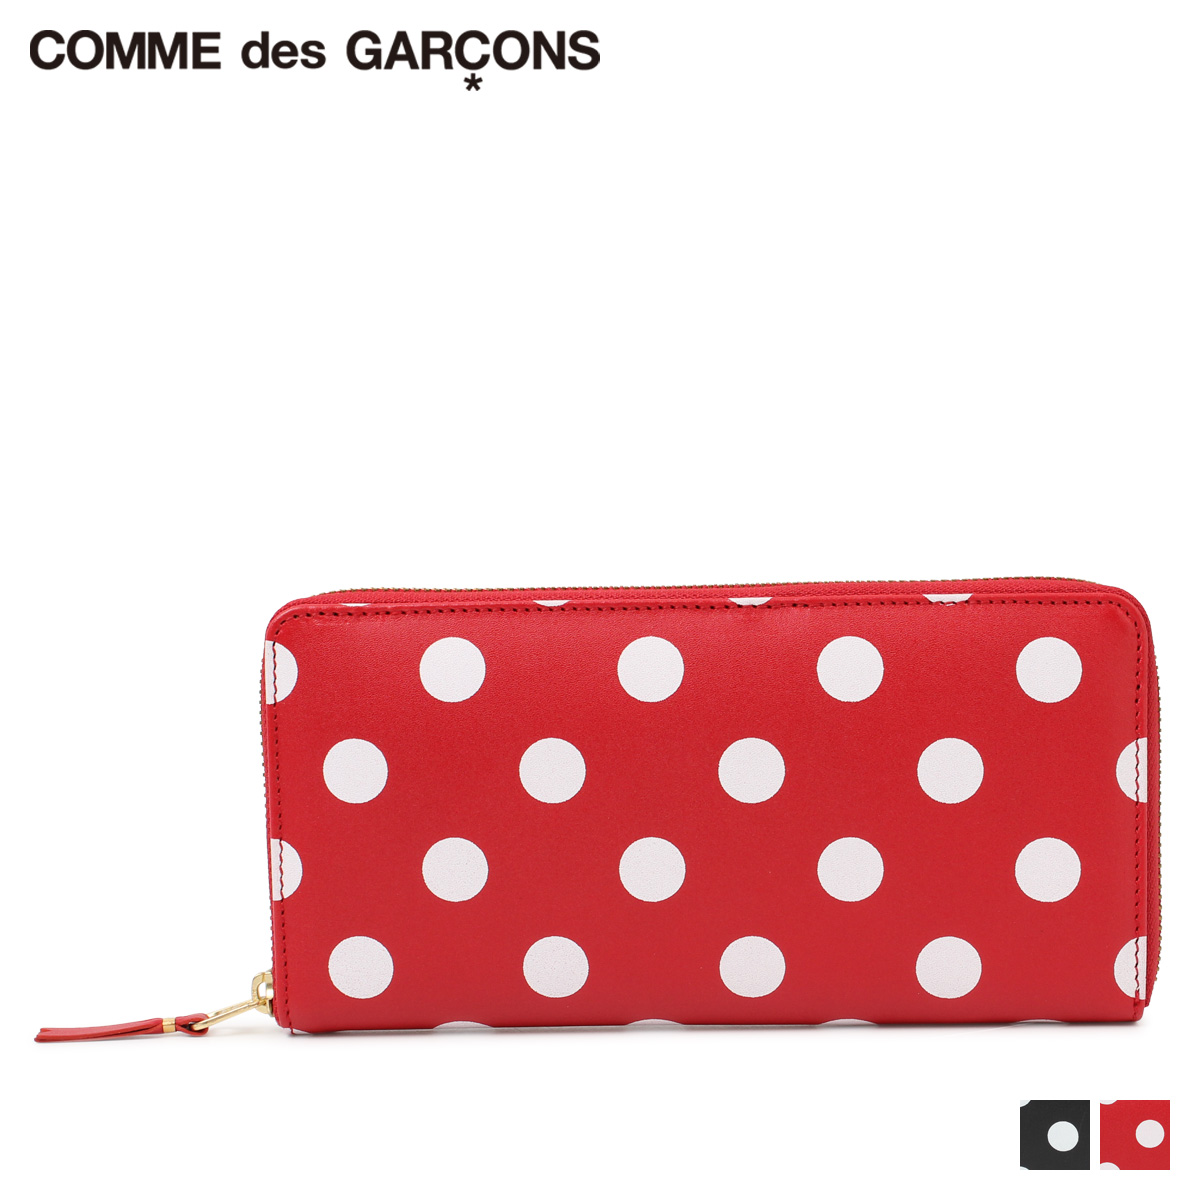 COMME des GARCONS POLKA DOTS PRINTED コムデギャルソン 財布 長財布 メンズ レディース ラウンドファスナー ポルカドットプリント ブラック レッド 黒 SA0110FL